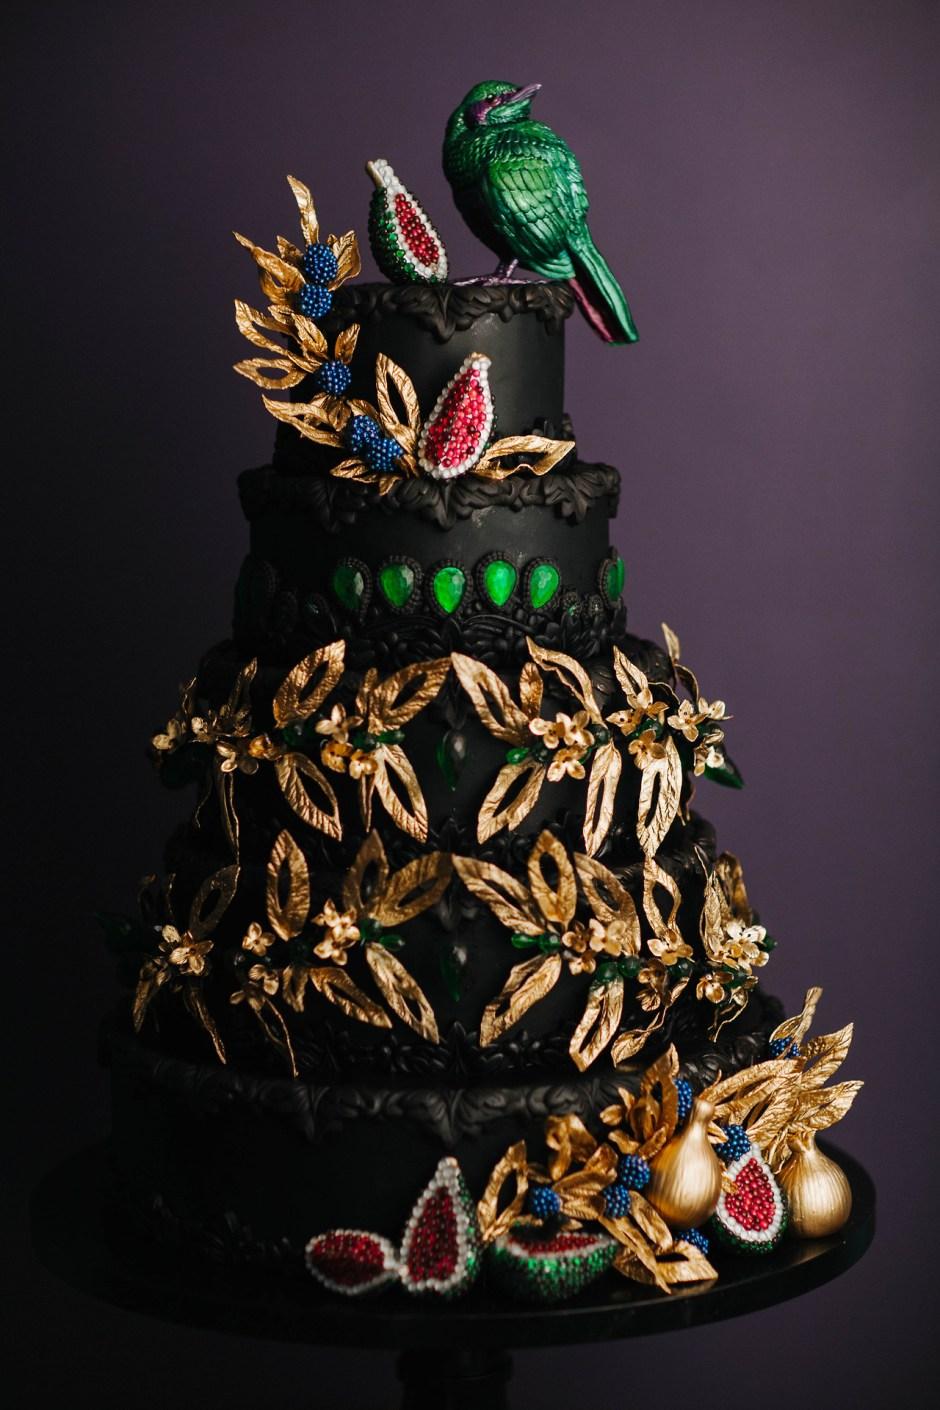 Emerald Wedding Cake I Couture Wedding Cake I Fashion Wedding Cake I Luxury Wedding Cake I Sugar Flower Wedding Cake I Avant Garde Wedding Cake I  Mischief Maker Cakes #mischiefmakercakes #luxury